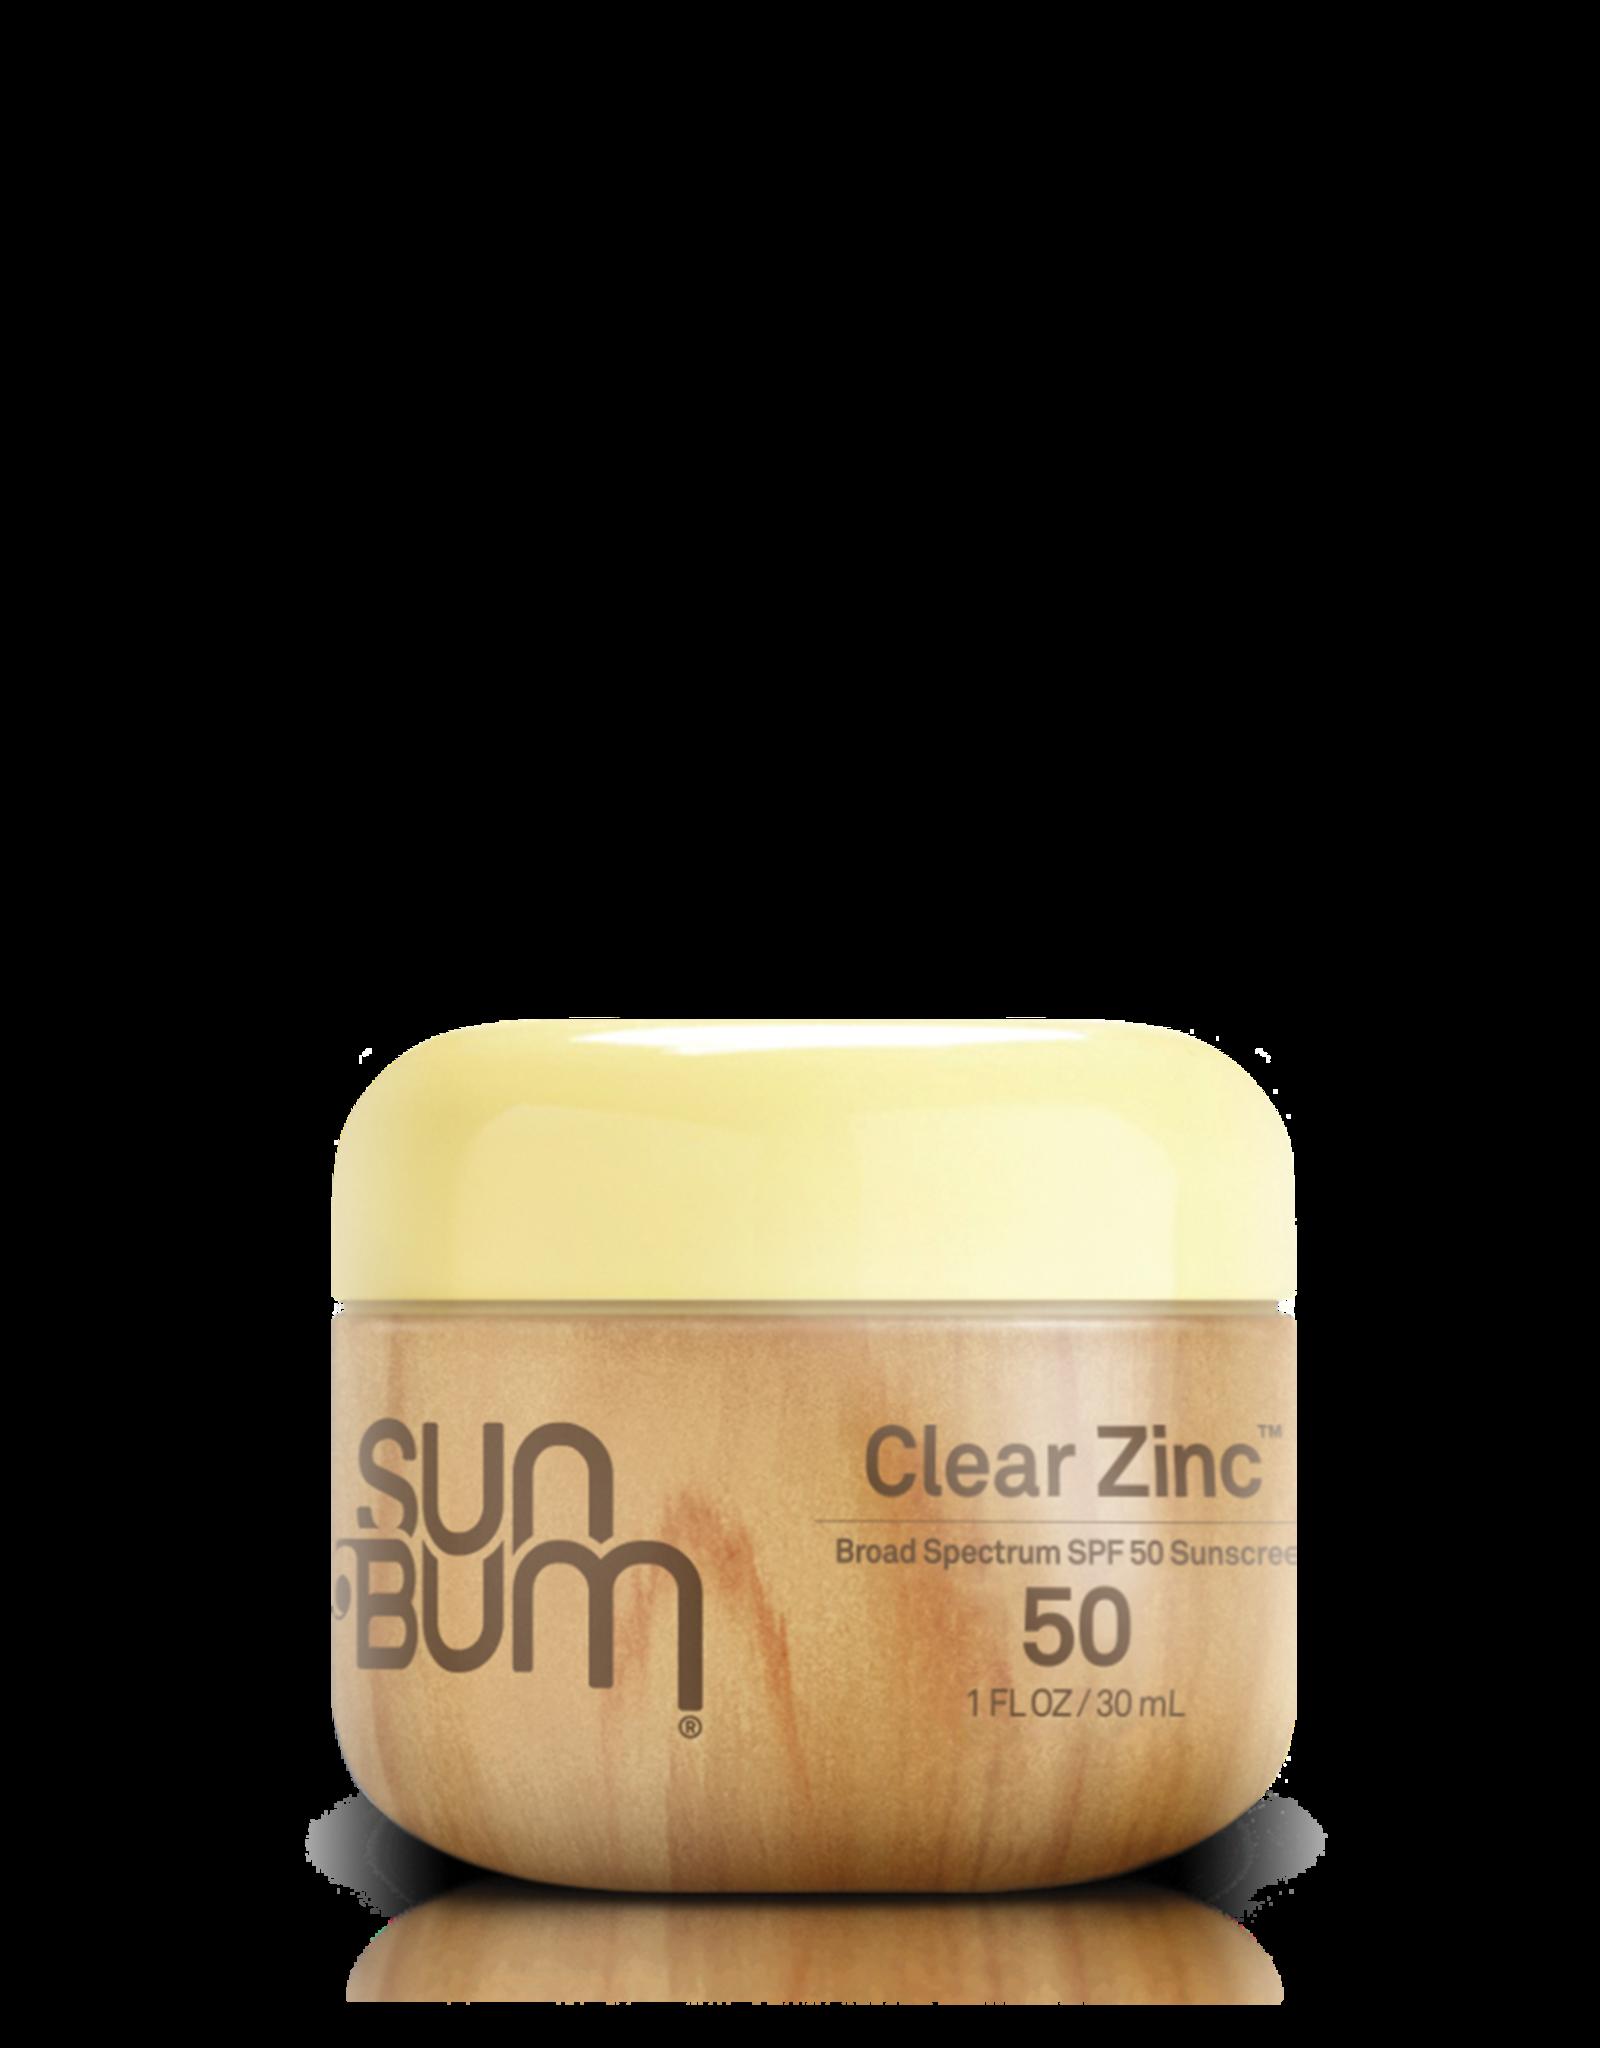 Sun Bum SPF 50 Sunscreen Face Cream